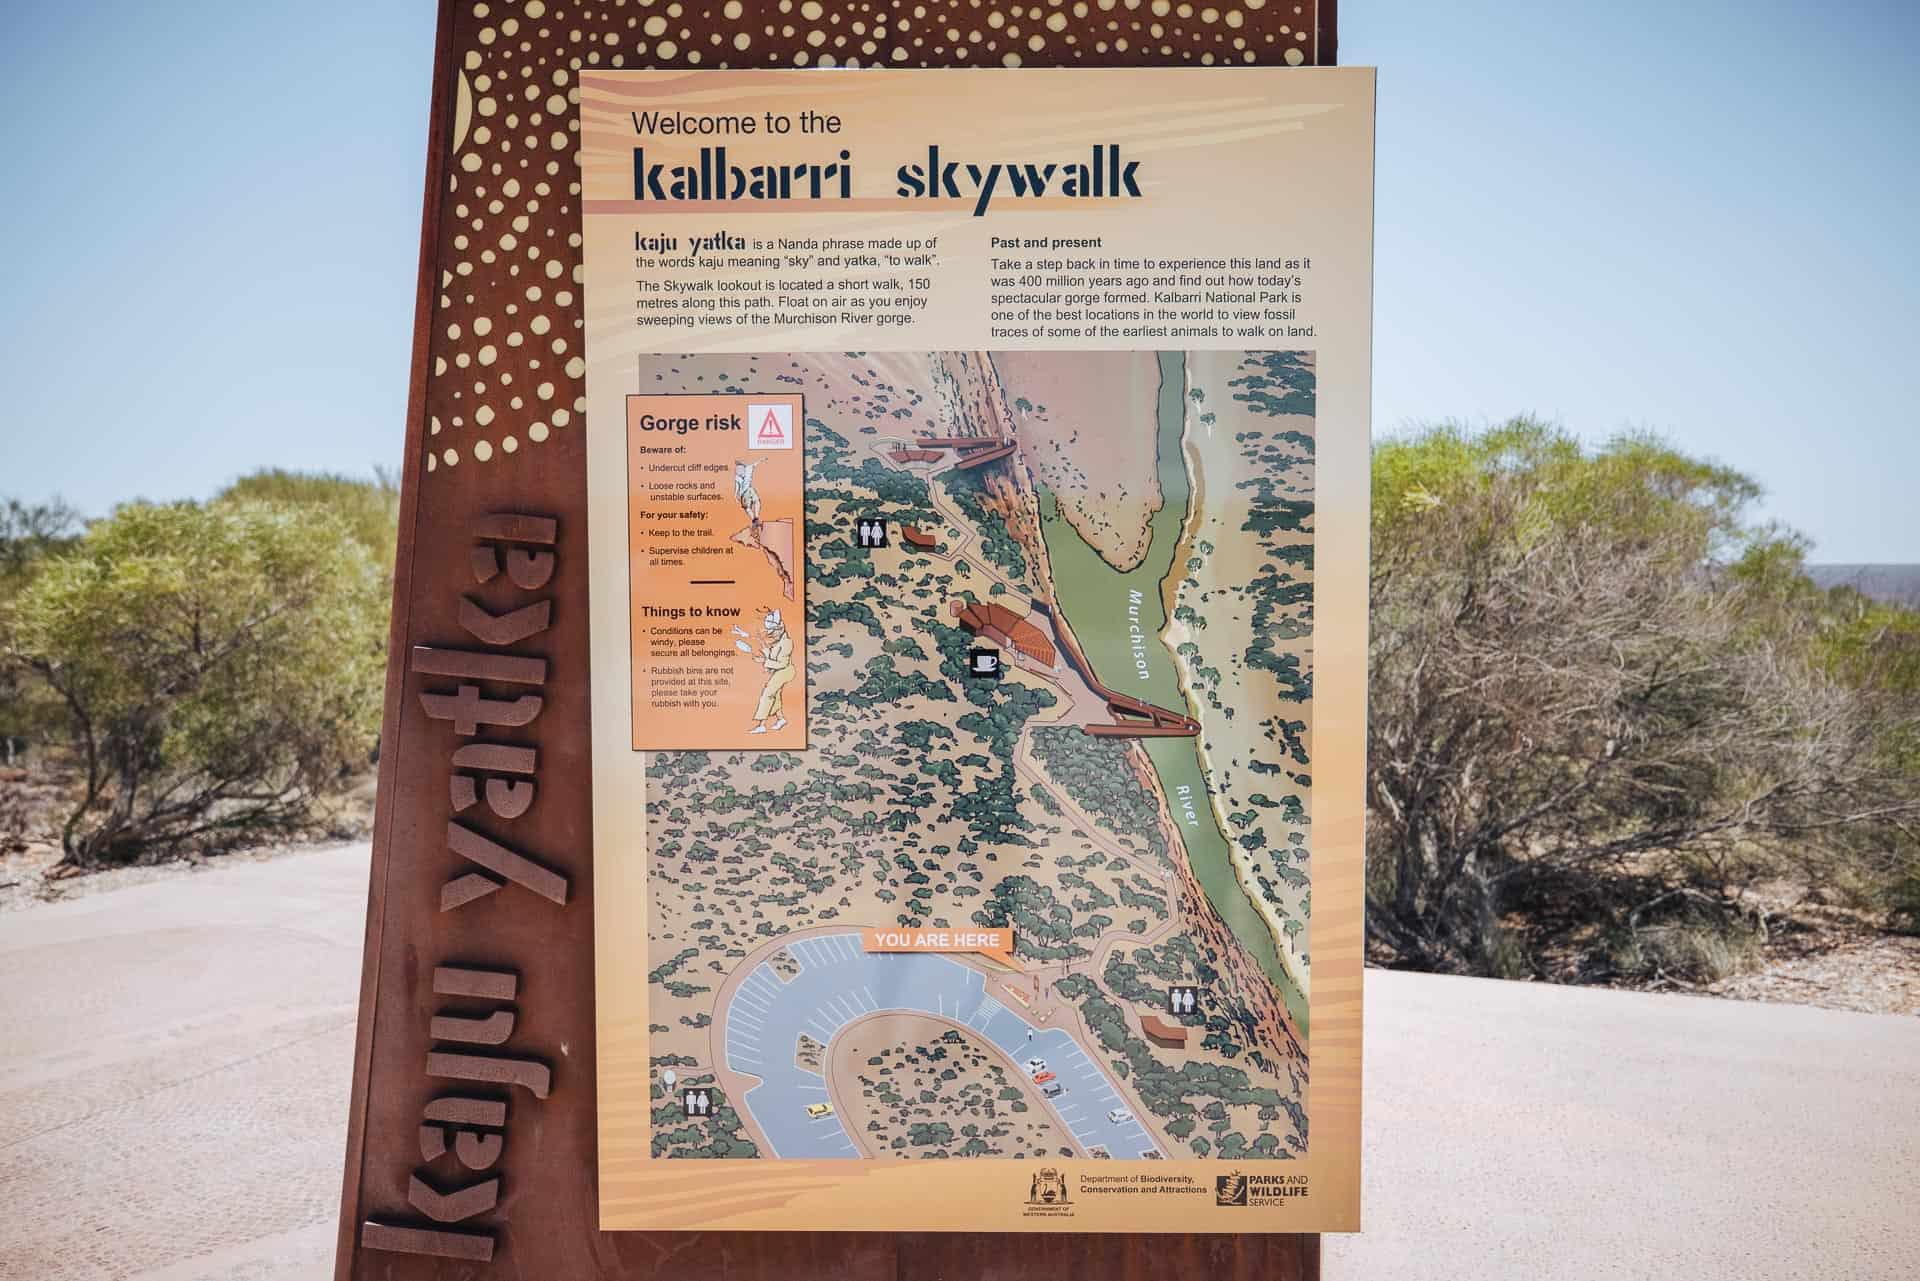 kalbarri skywalk, skywalk kalbarri, kalbarri national park